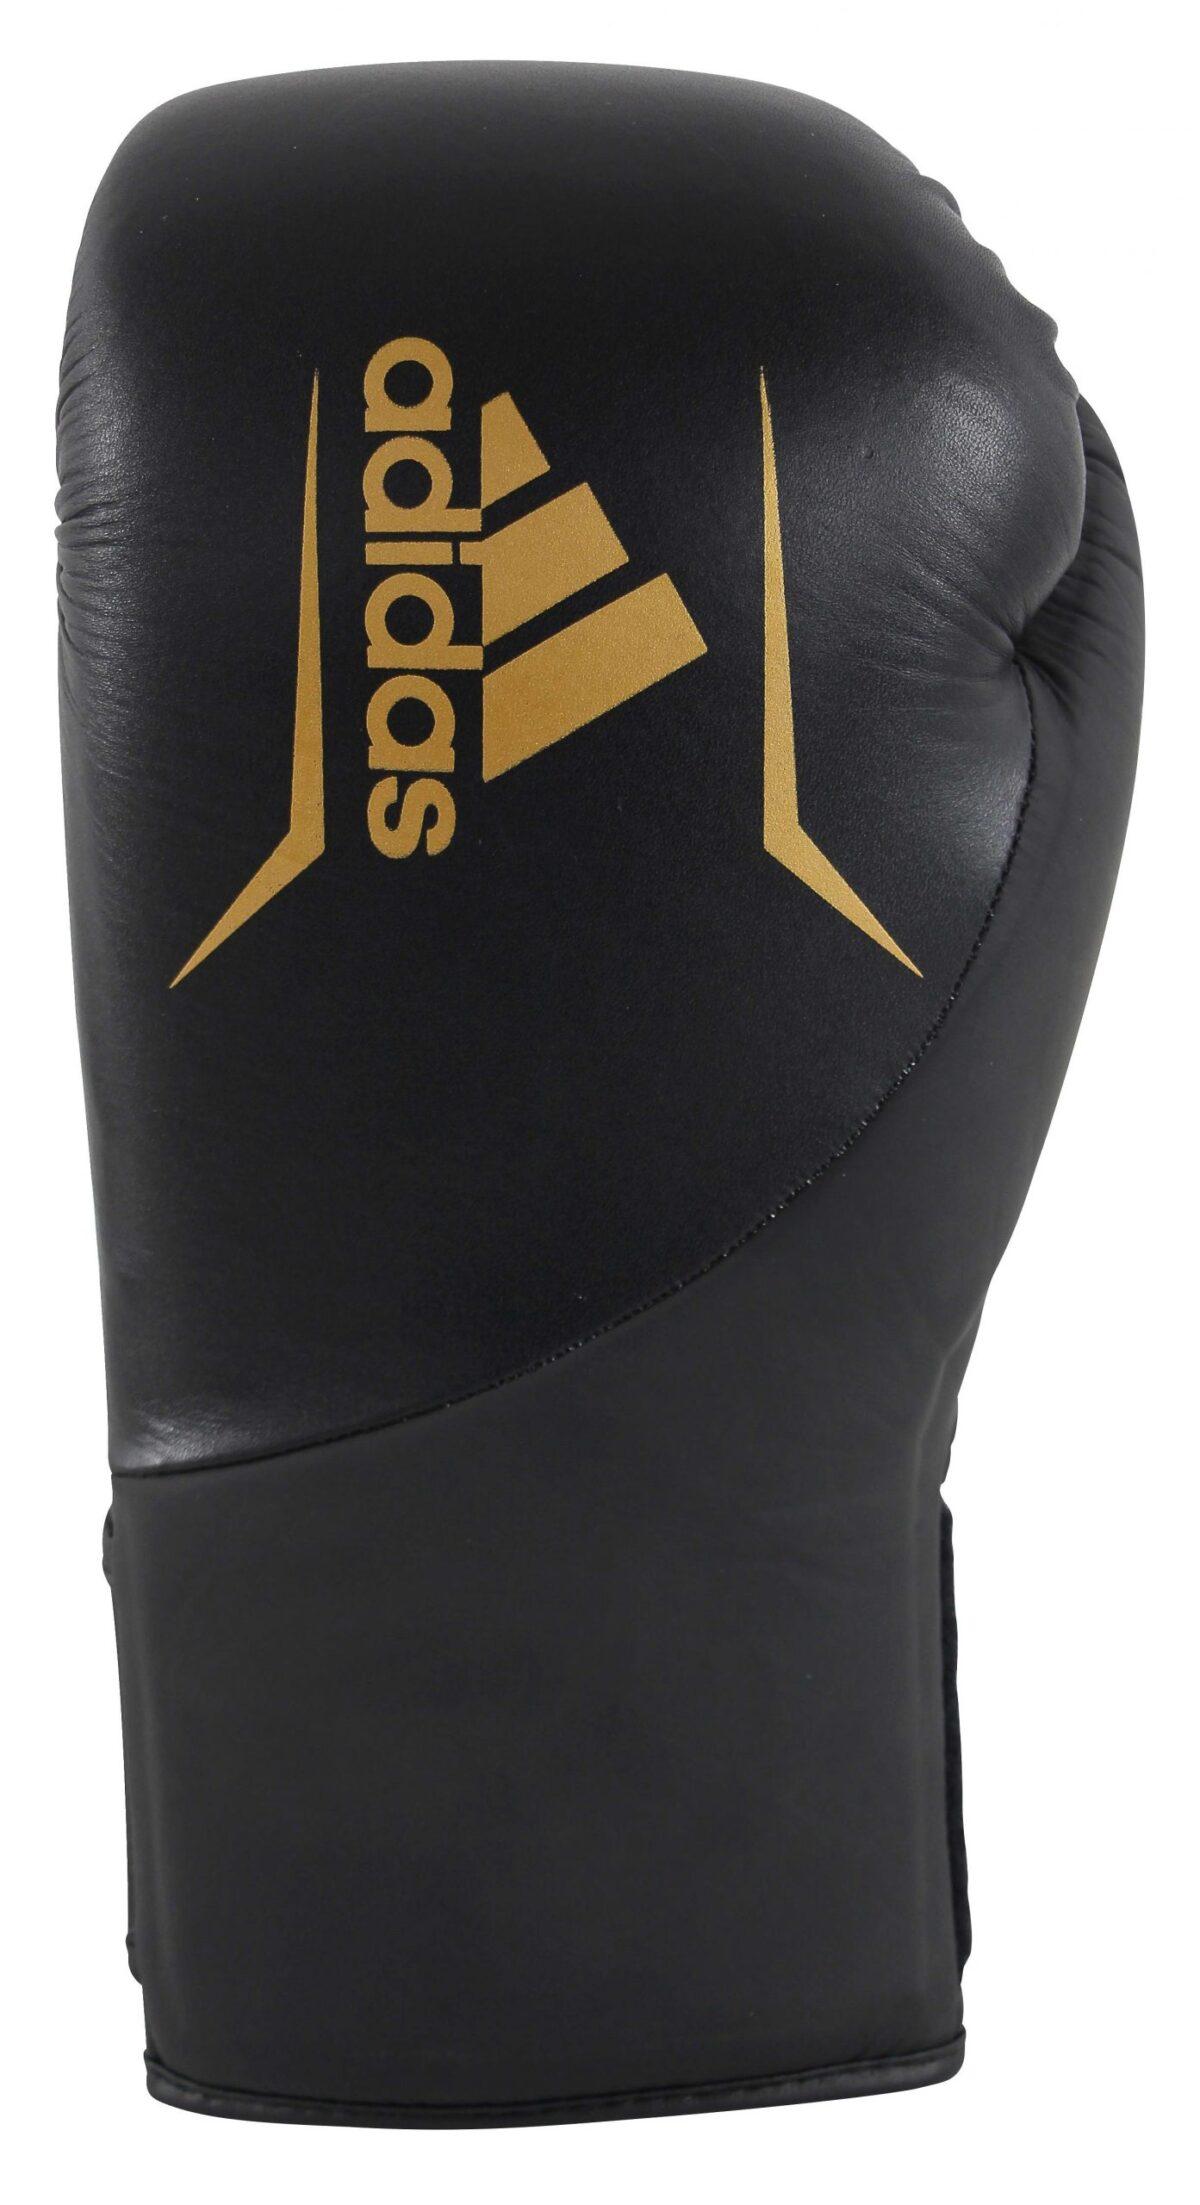 "Adidas Boxhandschuhe ""Speed 200"""